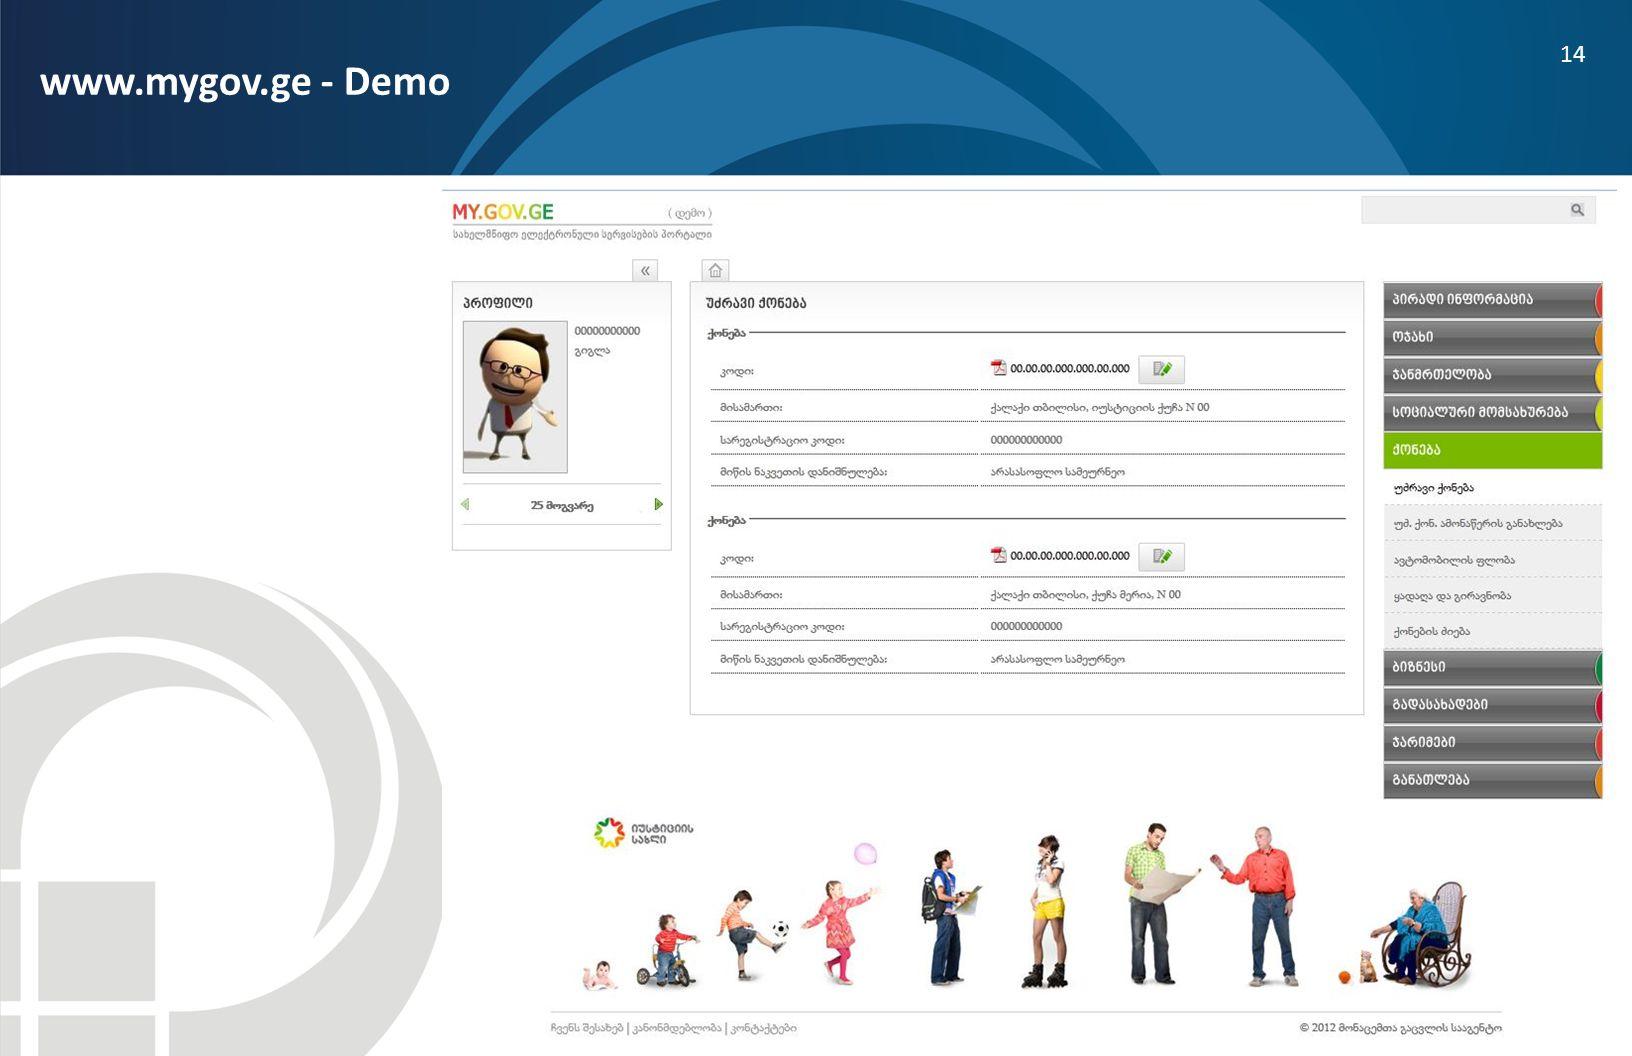 www.mygov.ge - Demo